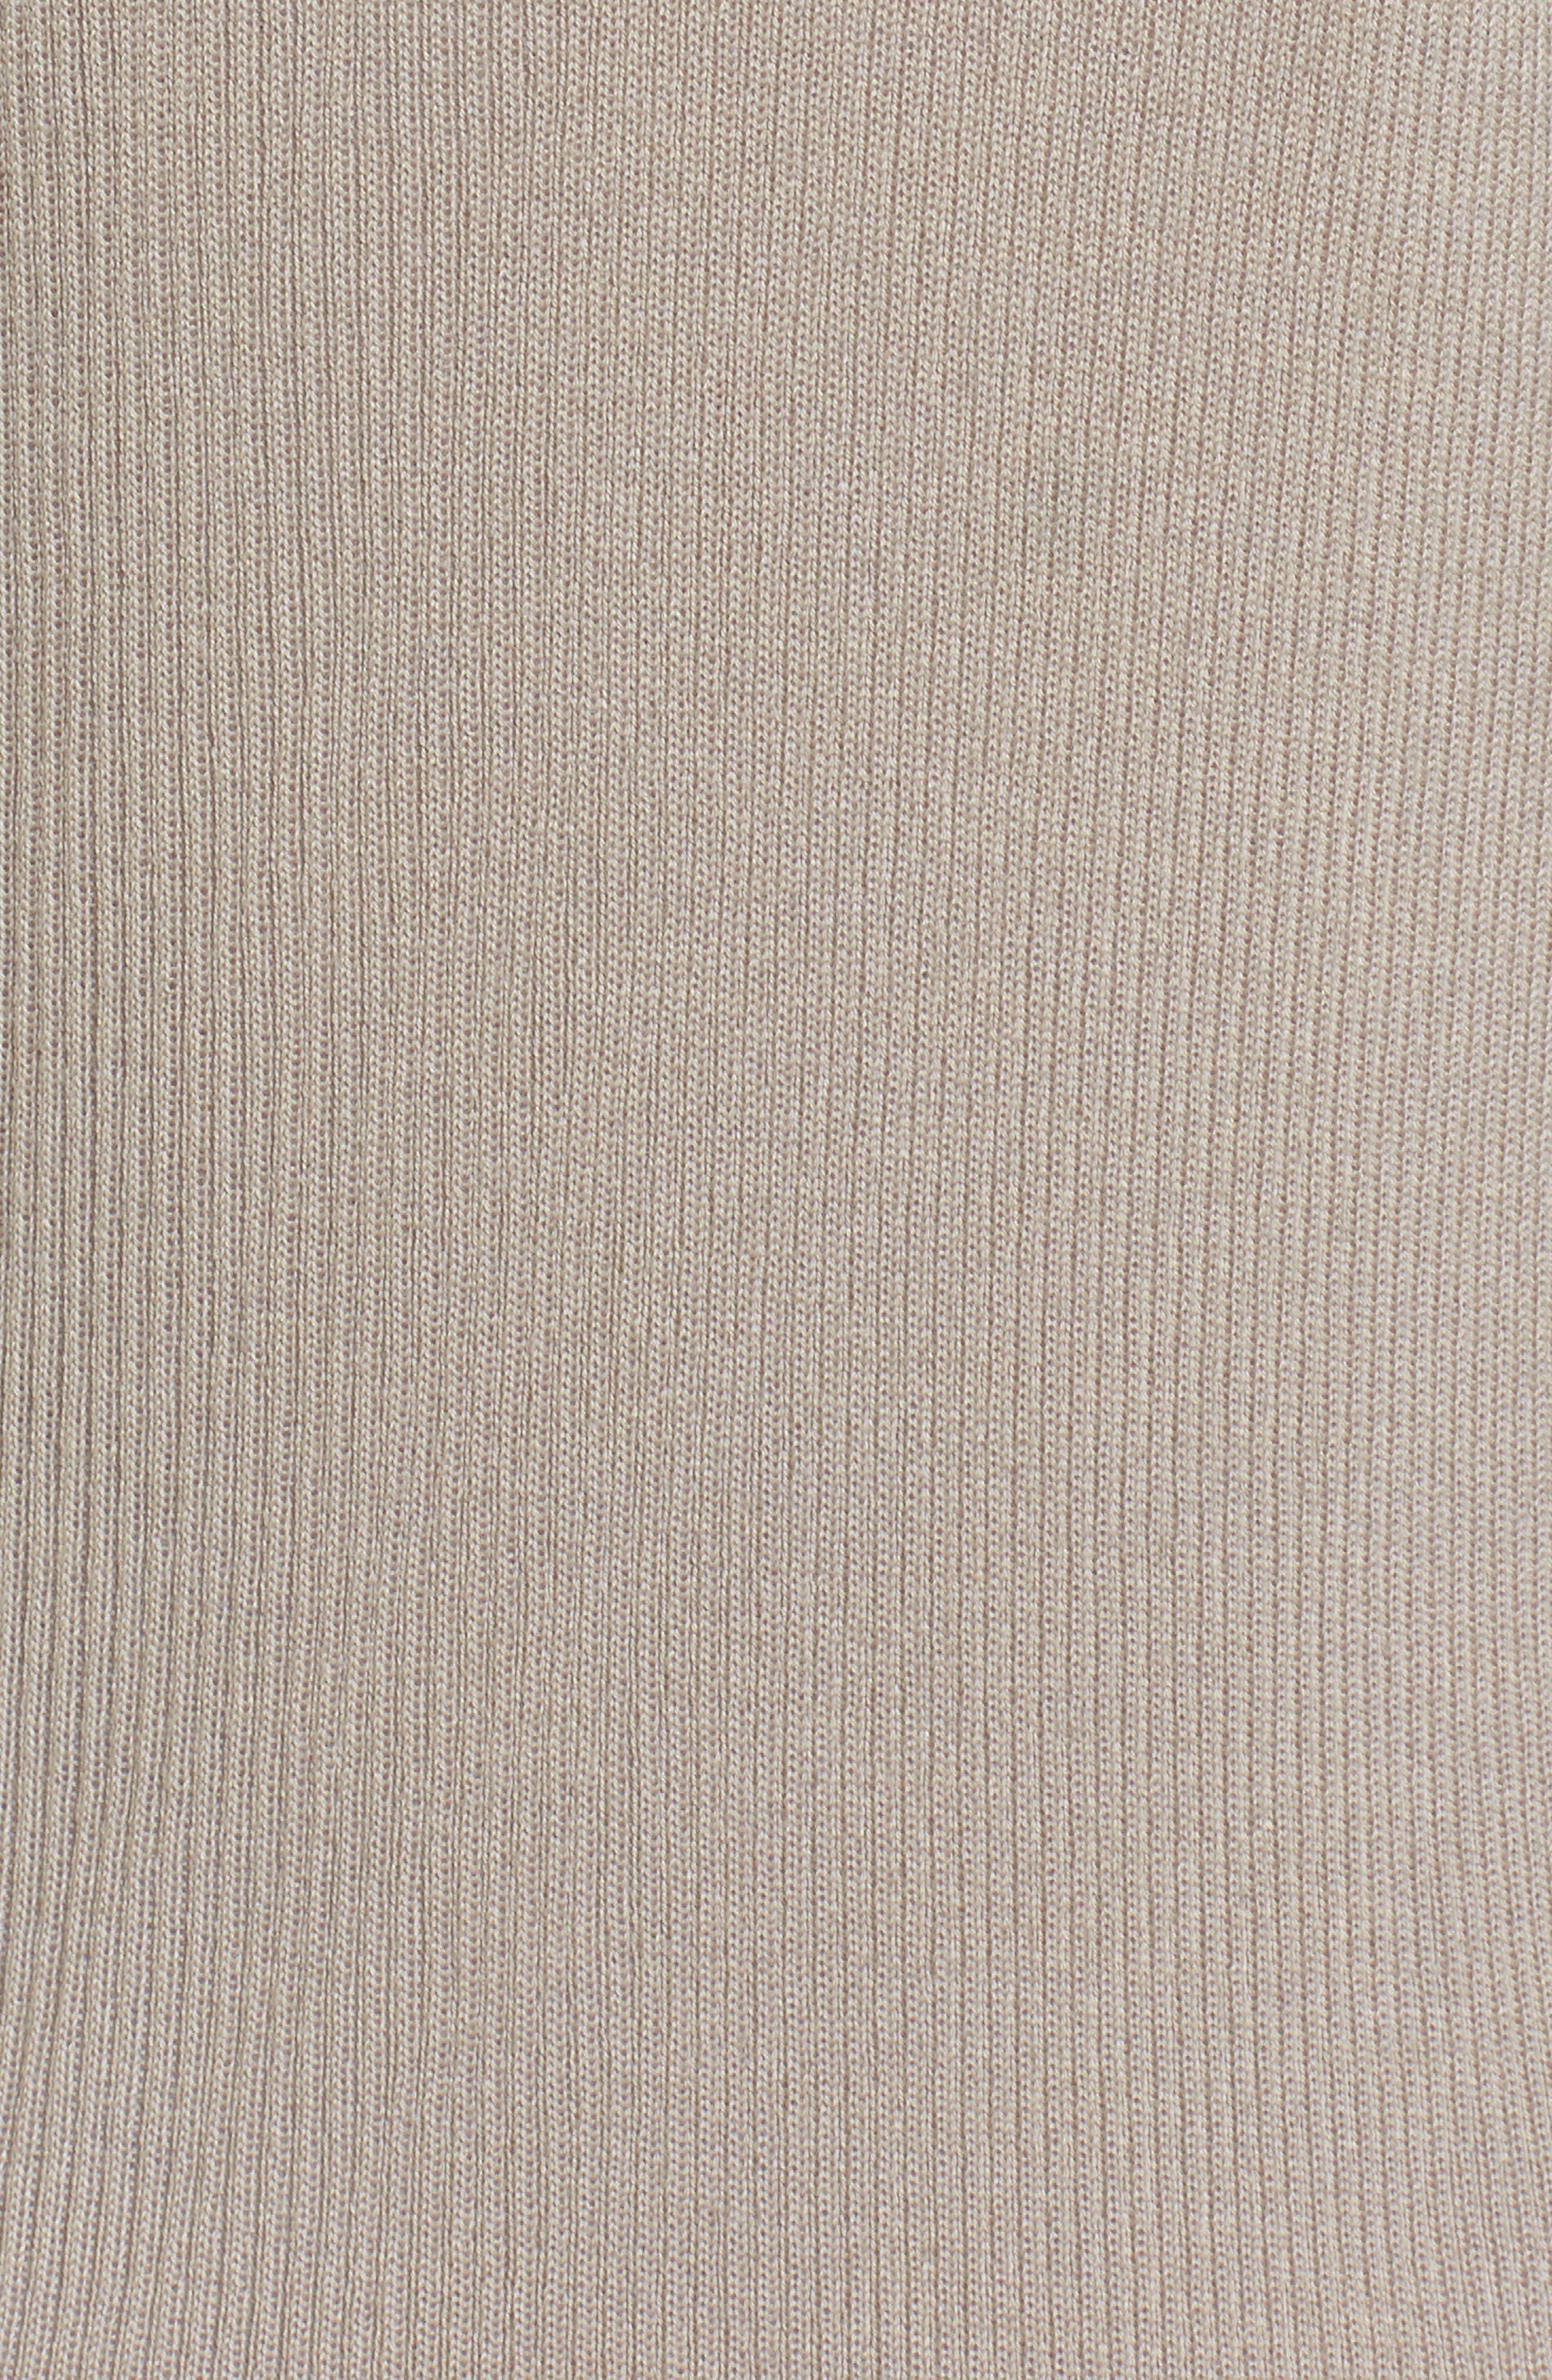 Rib Knit Wool Blend Cardigan,                             Alternate thumbnail 86, color,